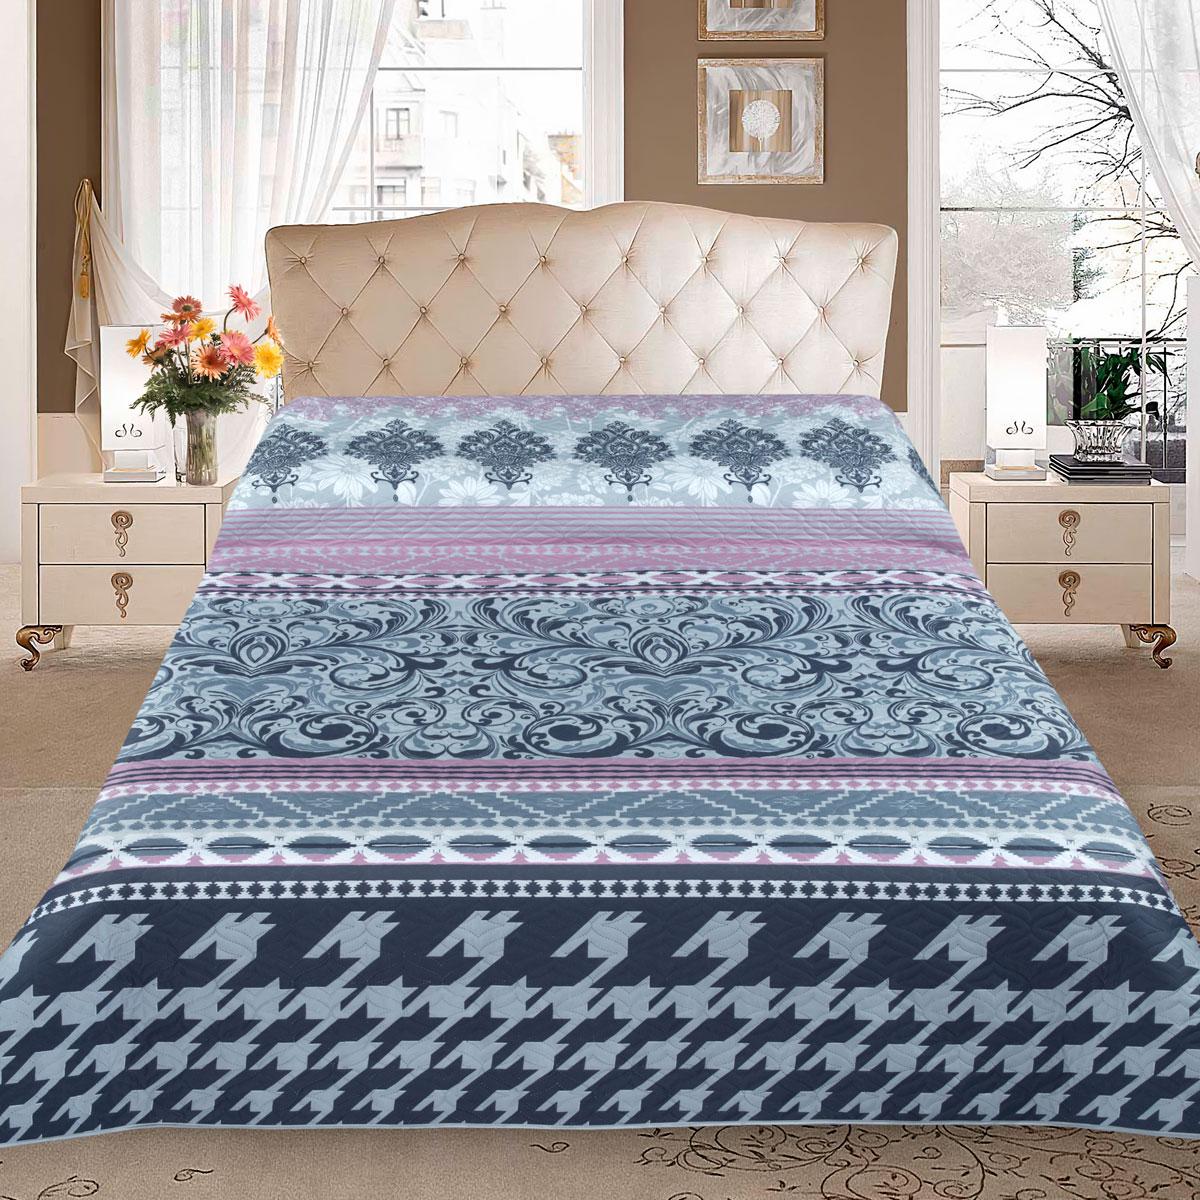 Покрывало Letto, цвет: синий, 210 x 240 см. pp26 letto двустороннее покрывало одеяло велокот 140 200 см